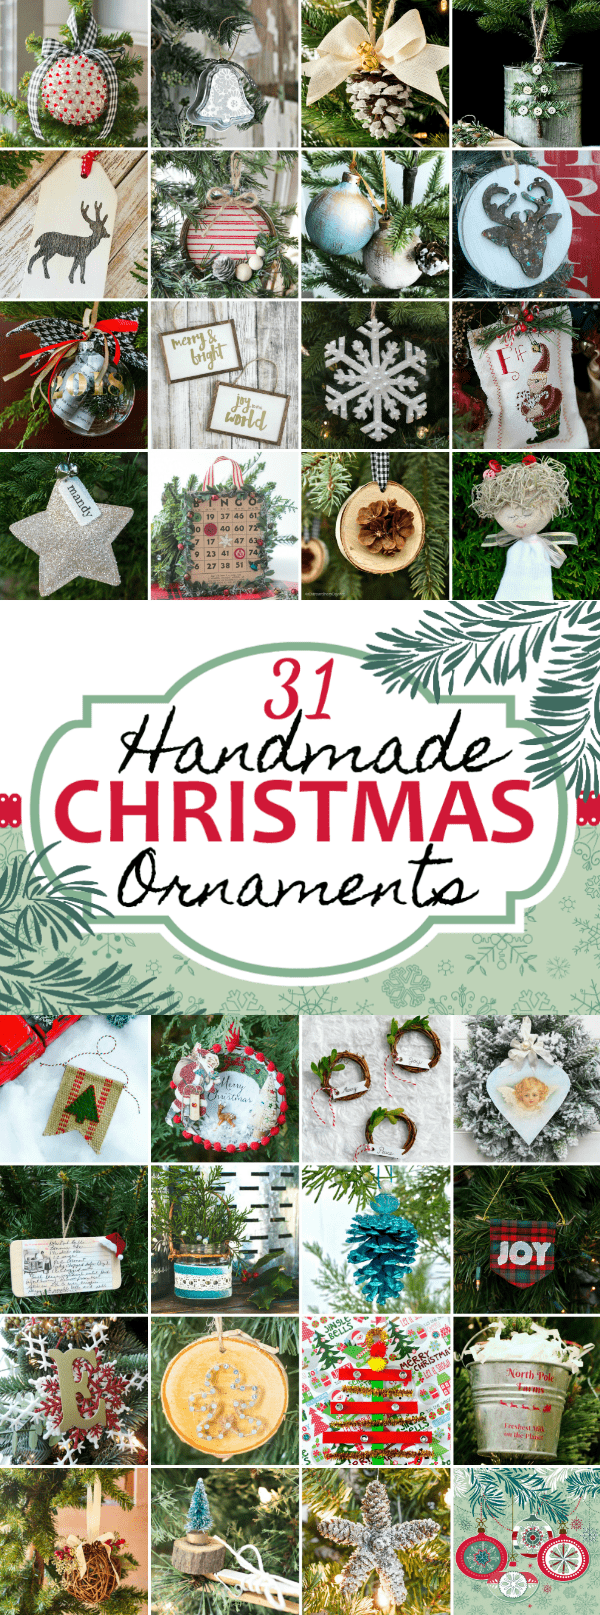 How To Make Cute Diy Farmhouse Christmas Ornaments Lovely Etc